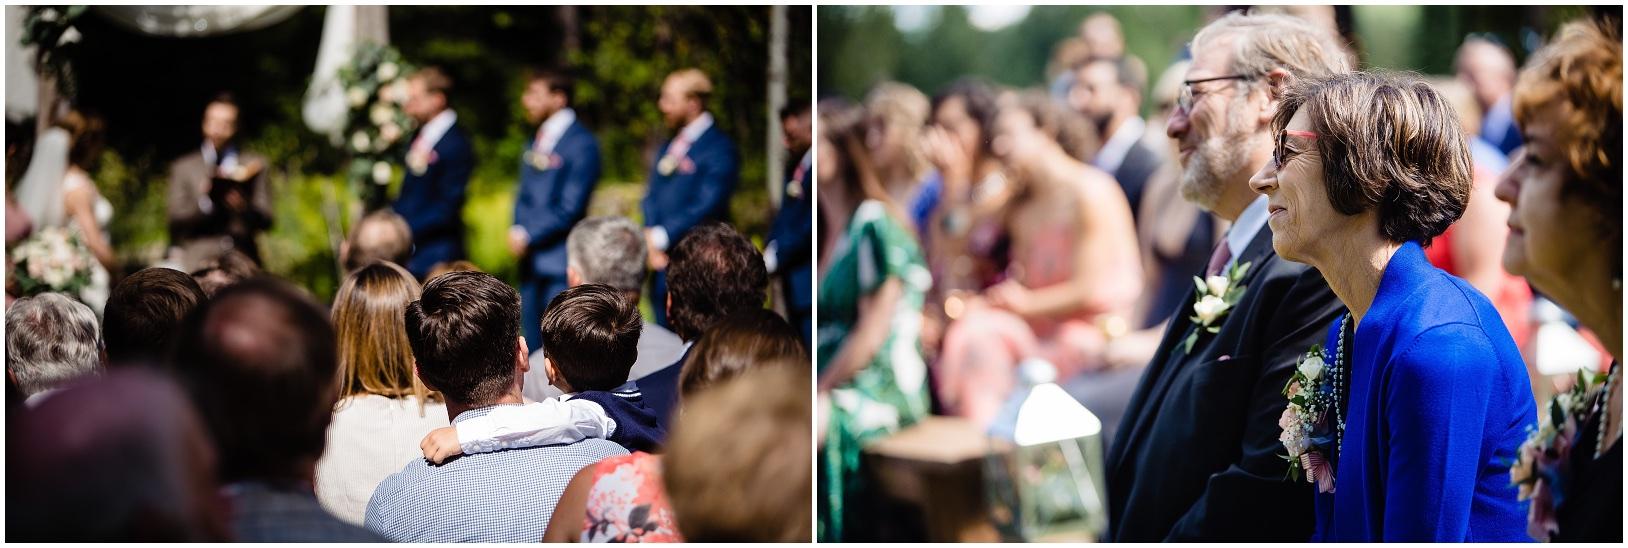 lindseyjanephoto_wedding0064.jpg